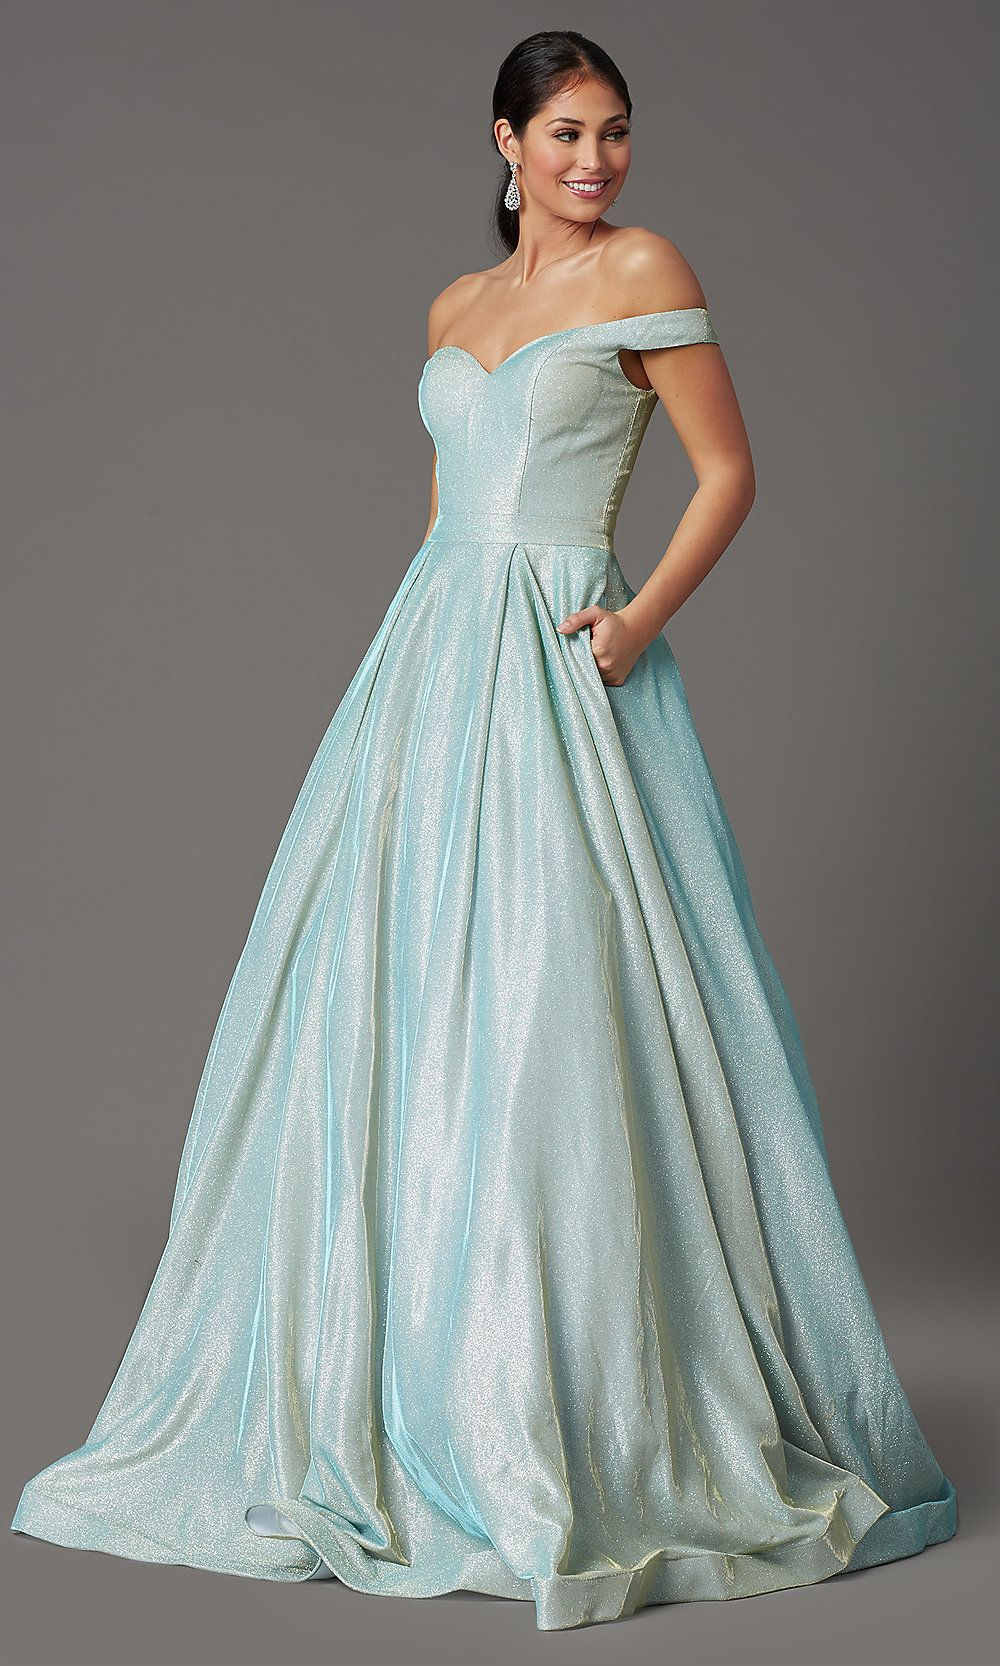 Long Off Shoulder Mint Green Prom Dress Promgirl Mint Green Prom Dress Green Prom Dress Ball Gowns [ 1666 x 1000 Pixel ]